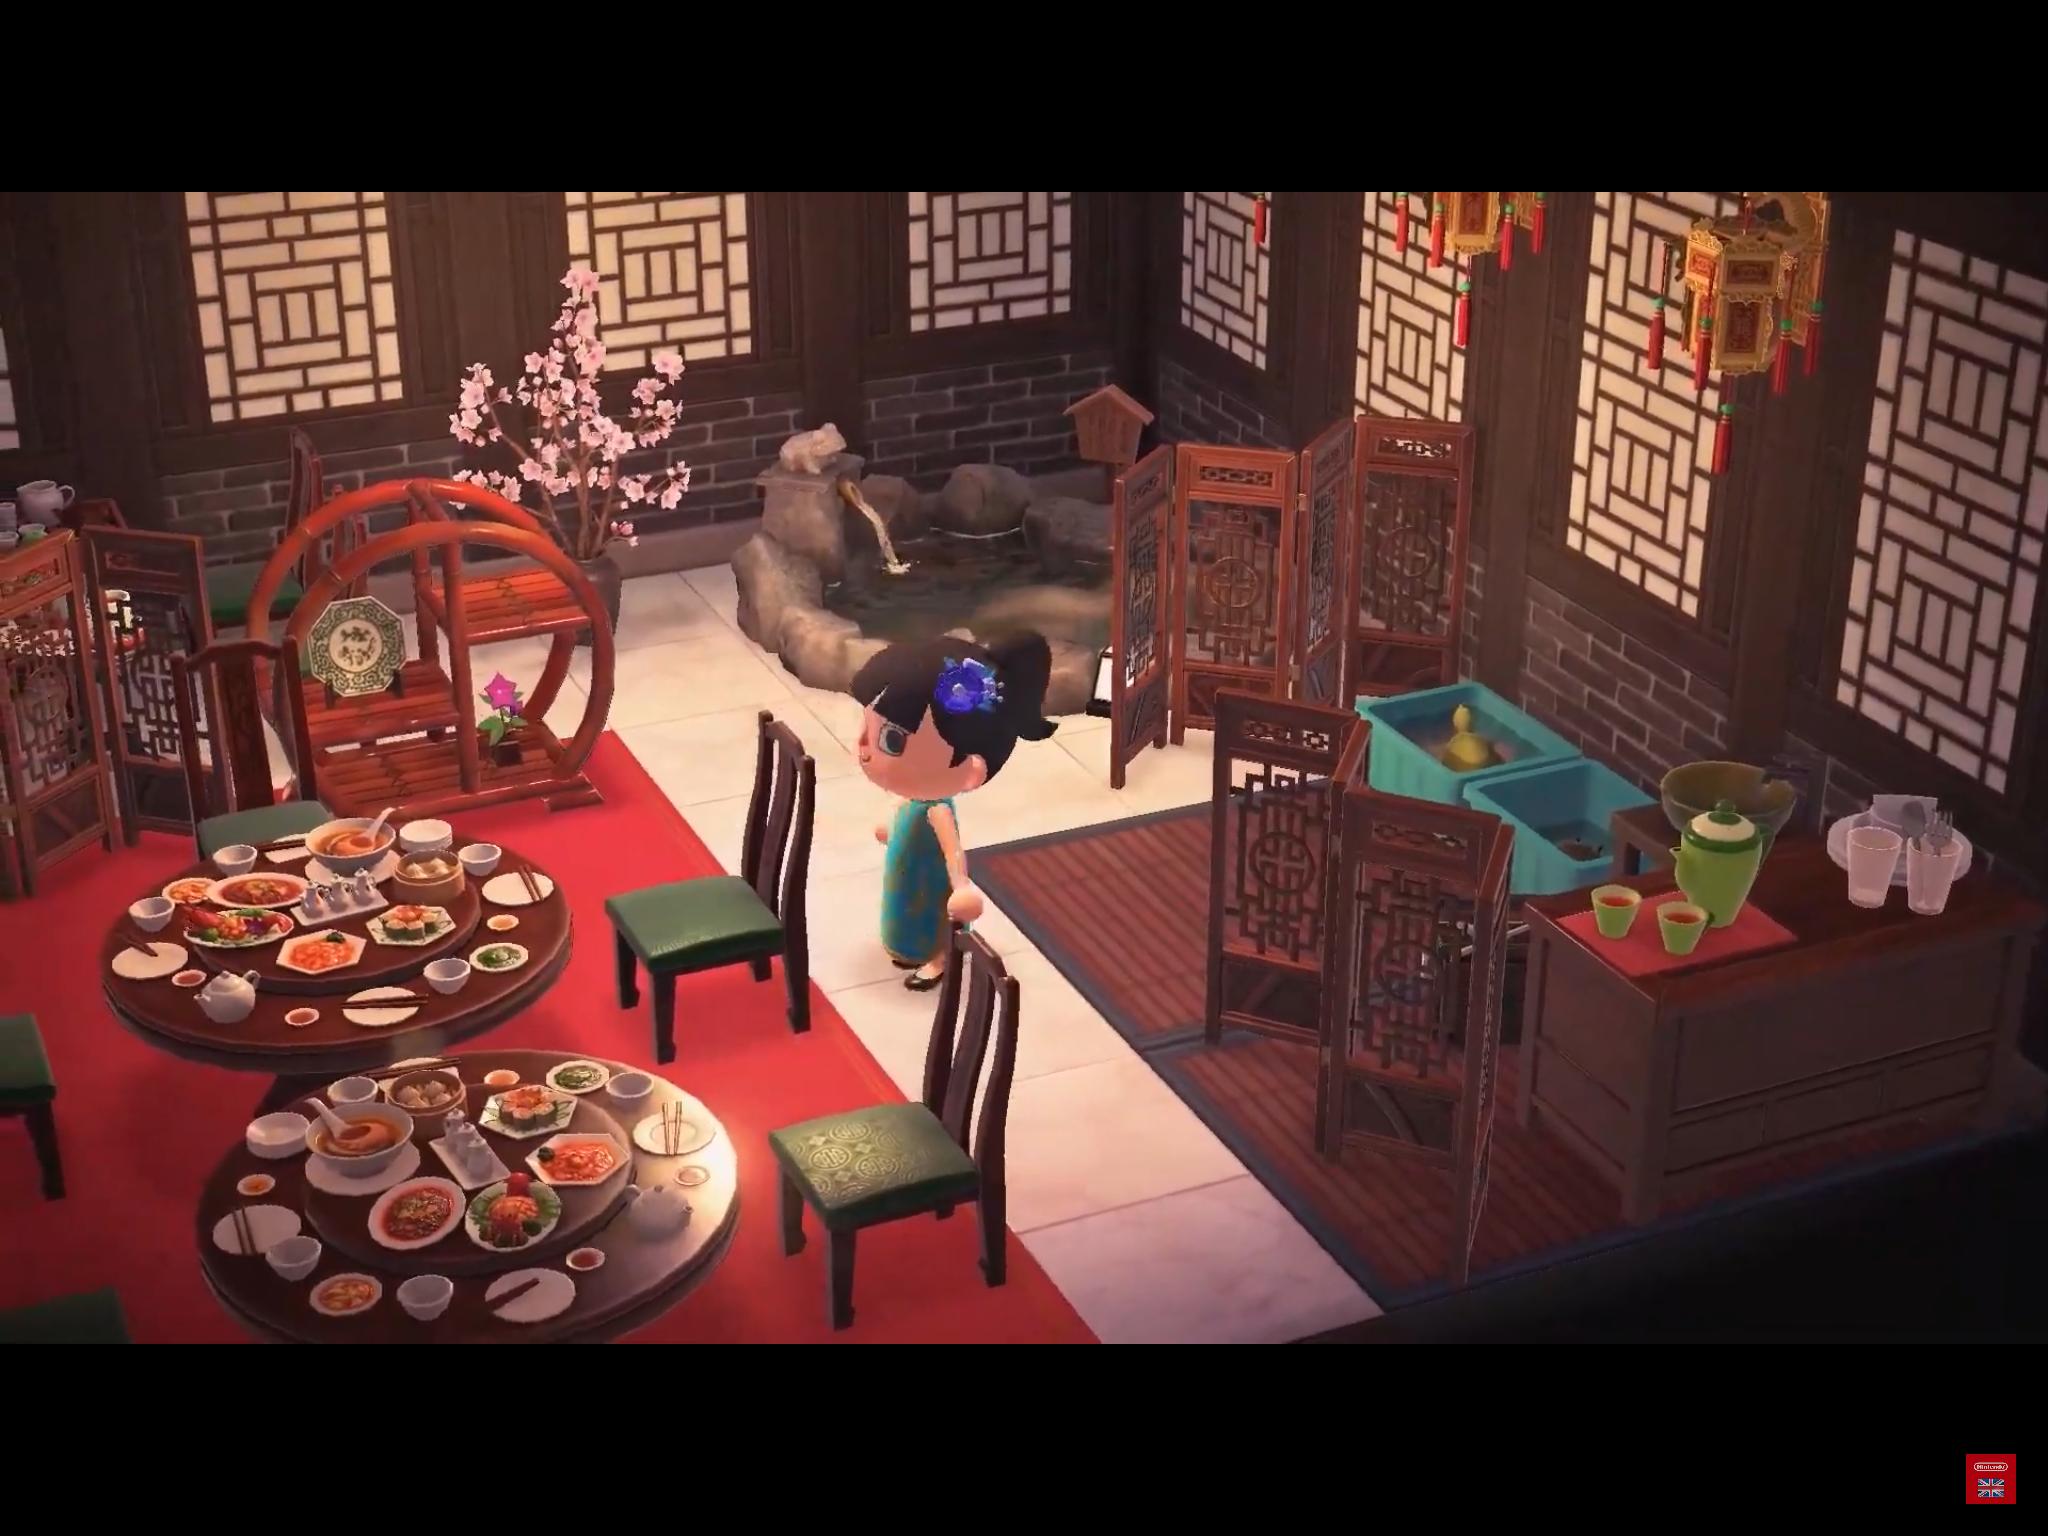 Acnh Direct 20 02 20 Animal Crossing Japanese Animals New Animal Crossing